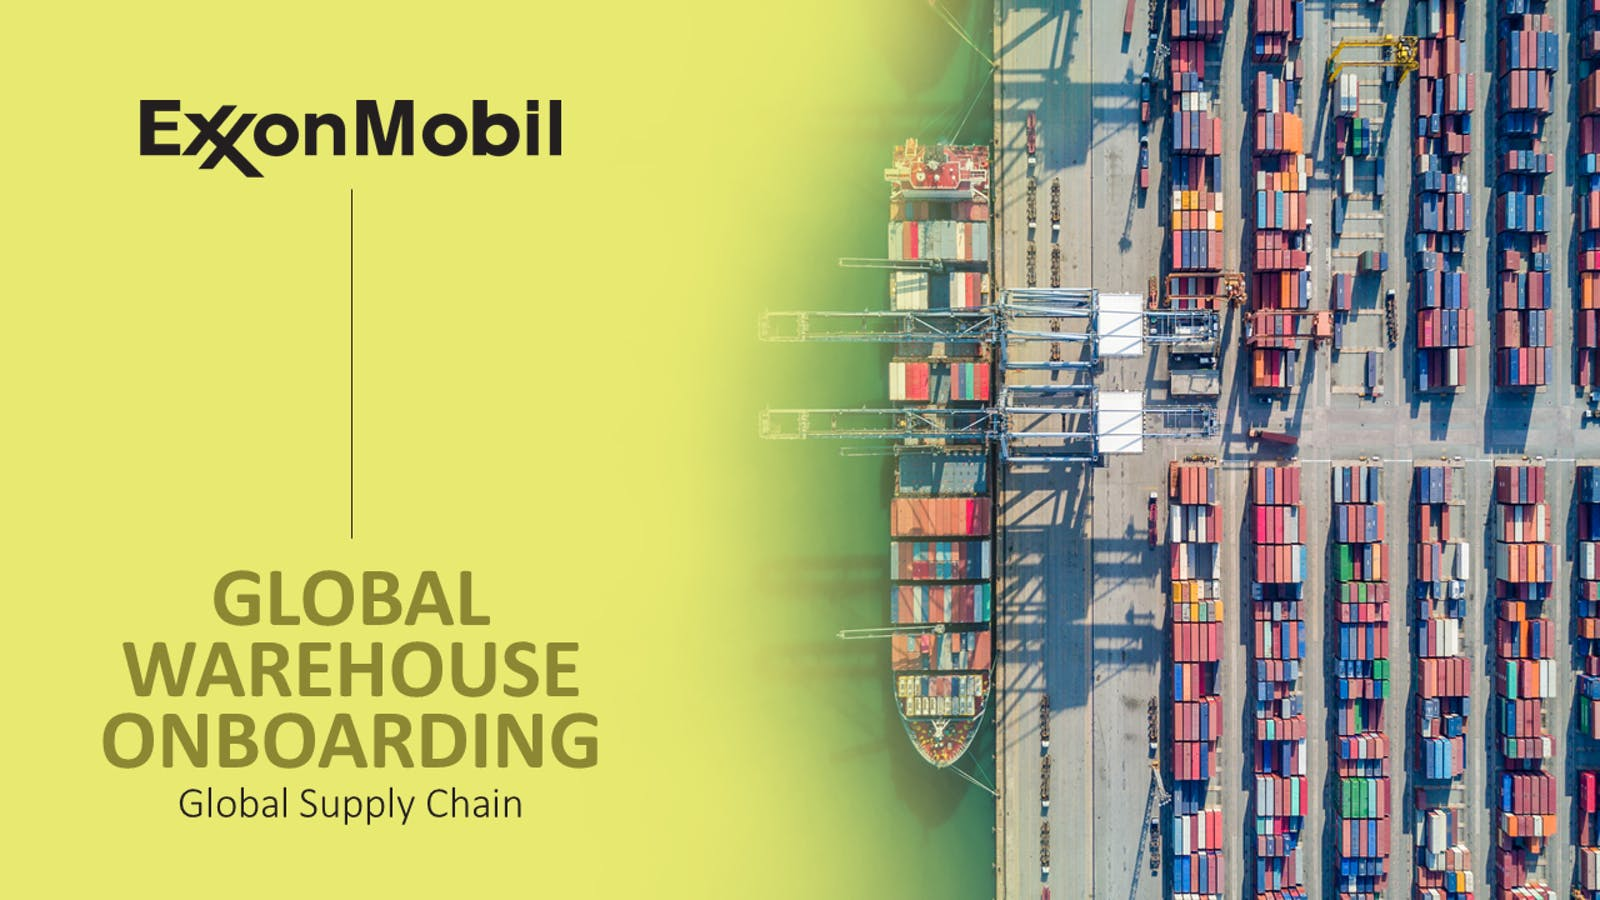 Exxon Supply Chain Ware Slide1